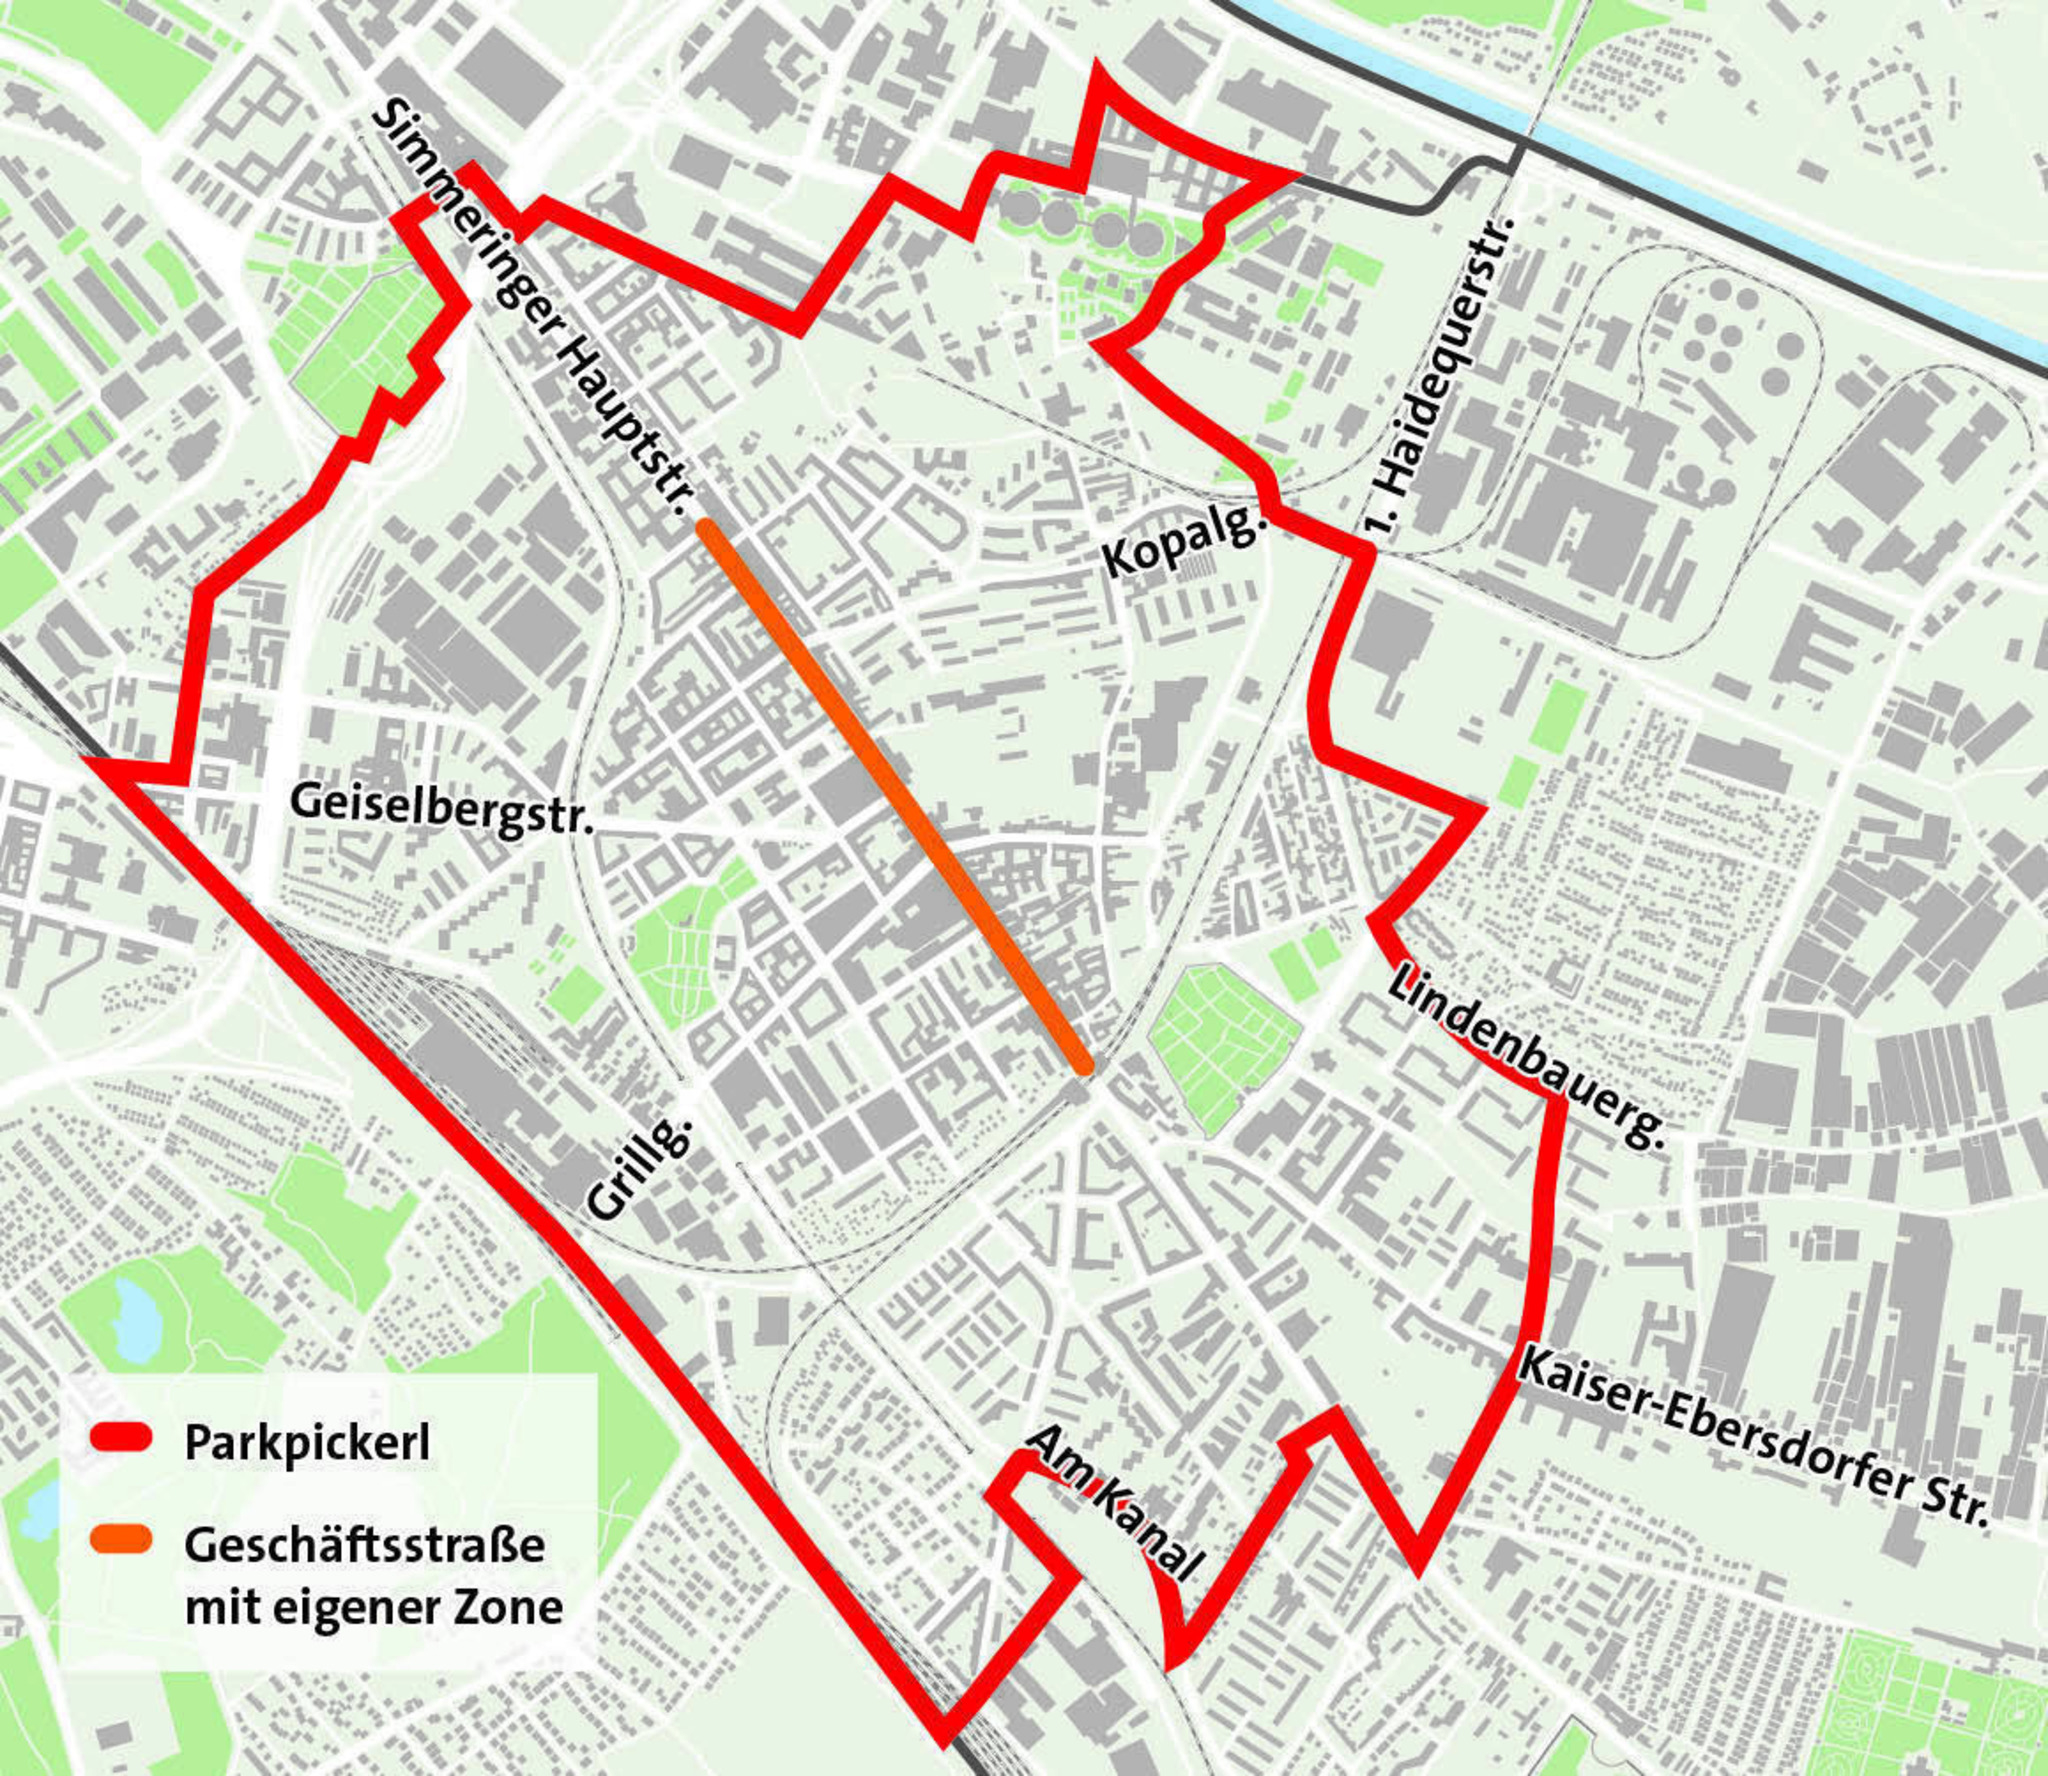 Wien Simmering Parkpickerl Startet Am 5 November Simmering